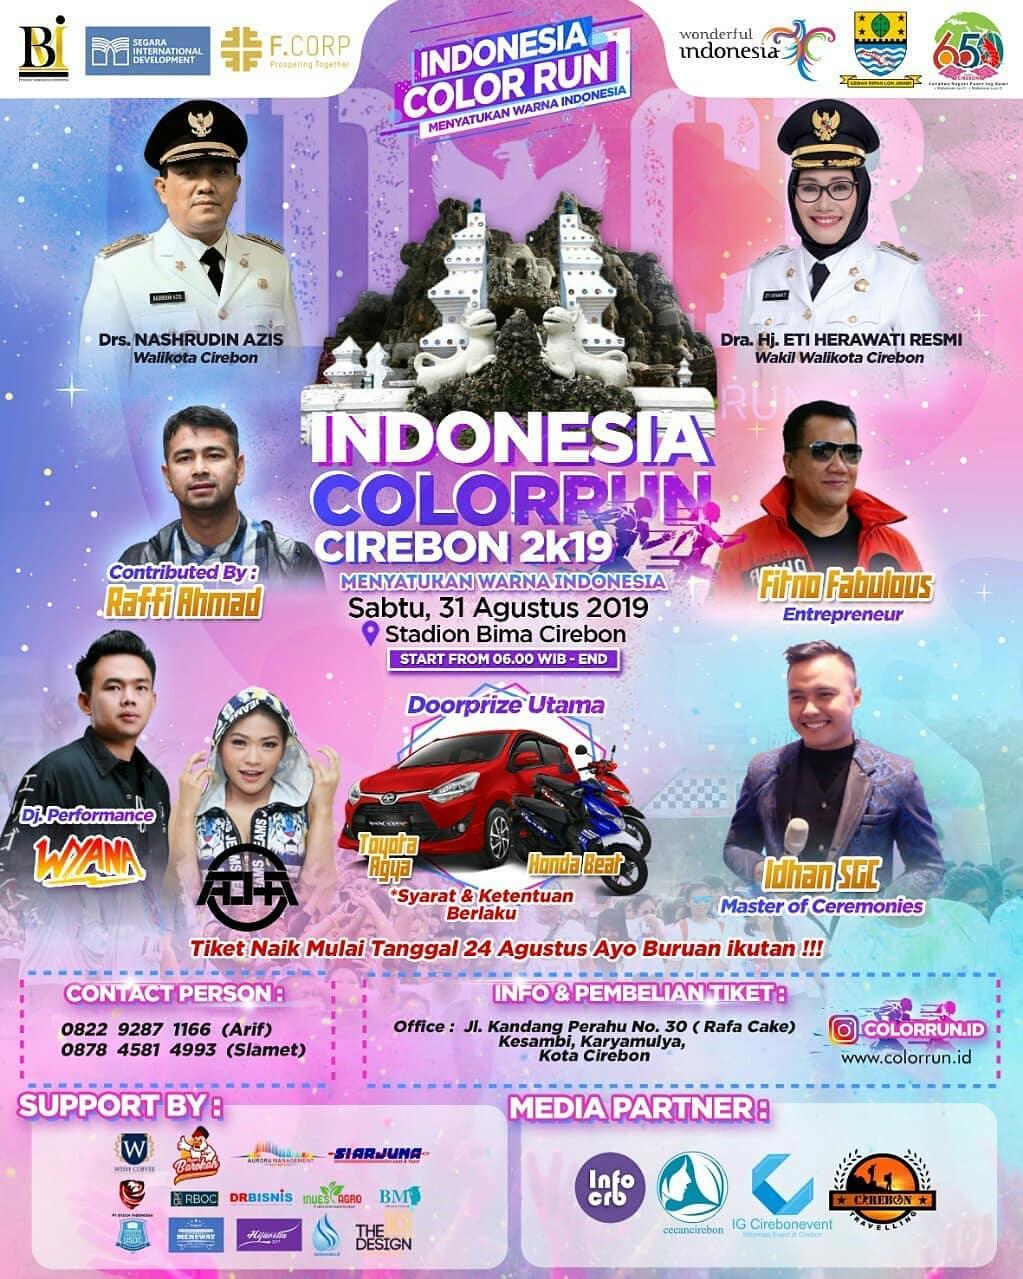 Indonesia Color Run - Cirebon • 2019